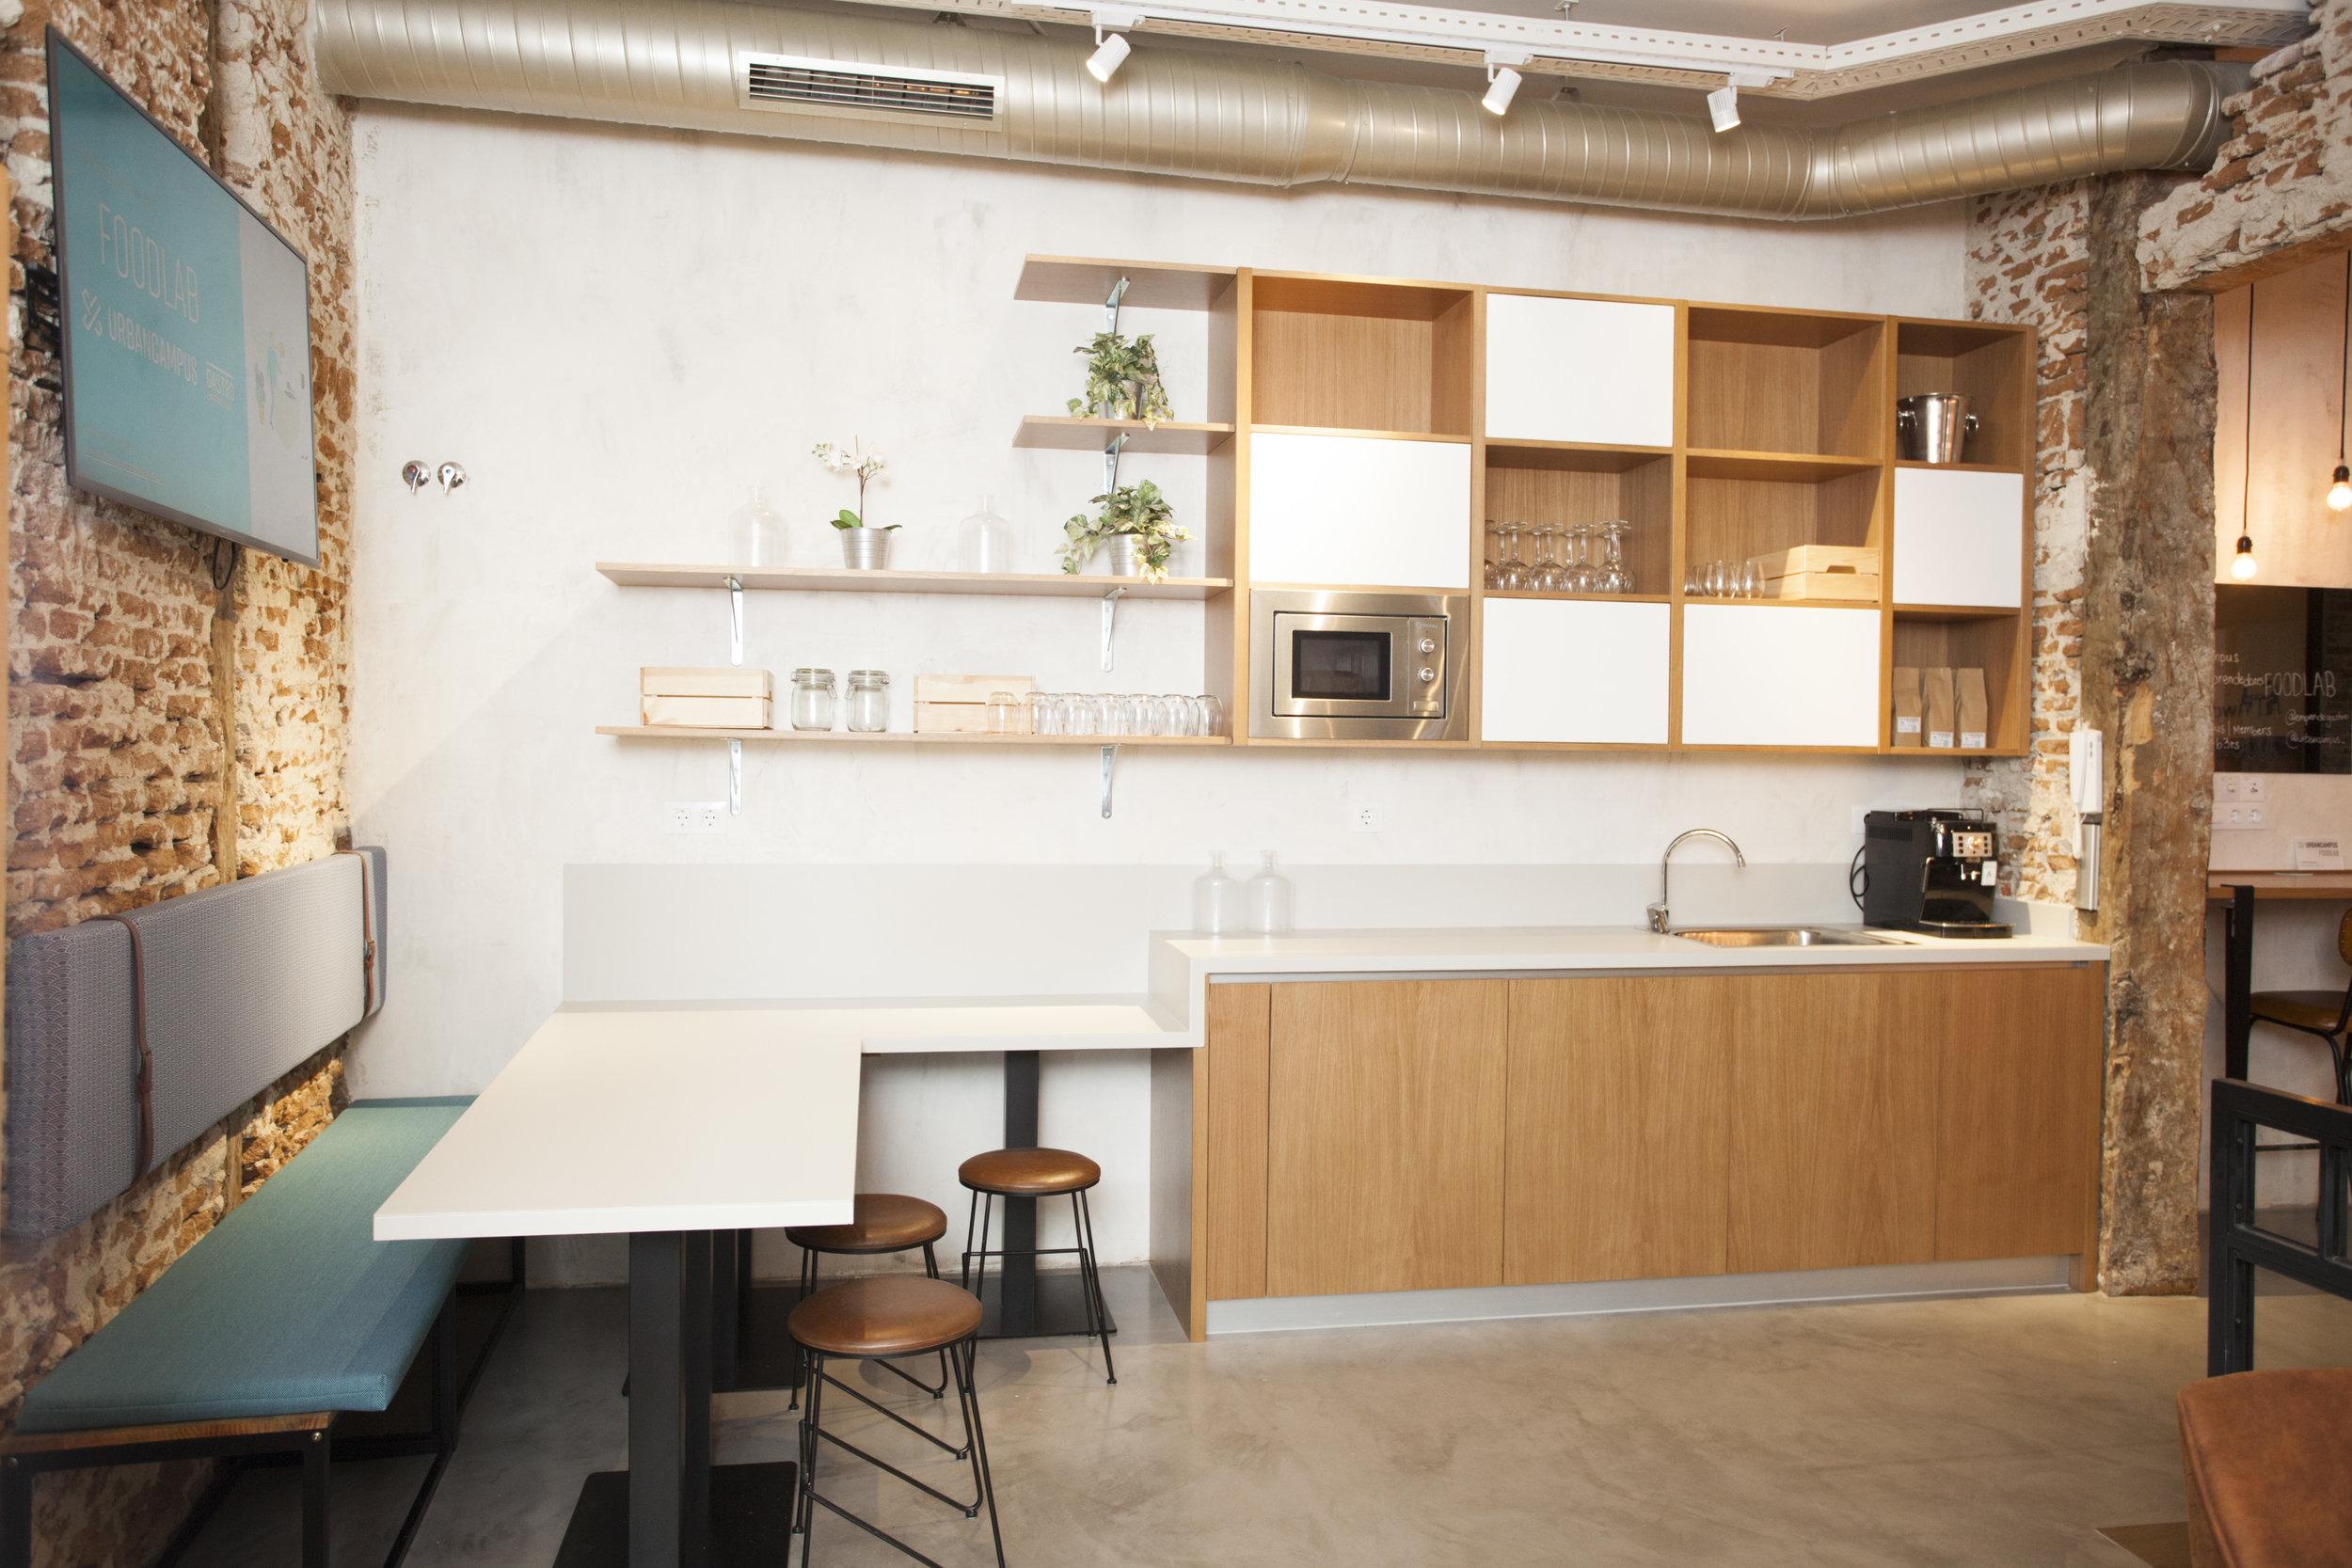 emmme studio restauracion Foodlab UrbanCampus office.jpg